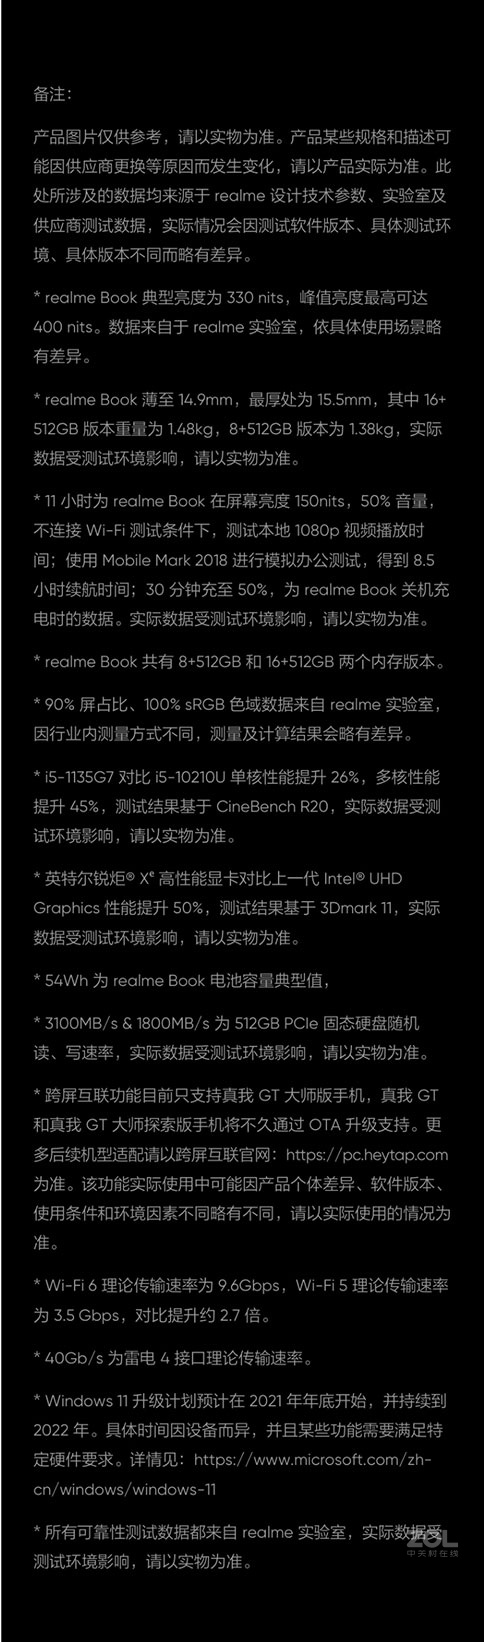 realme Book 14英寸(i5 1135G7/8GB/512GB/集显)评测图解图片33